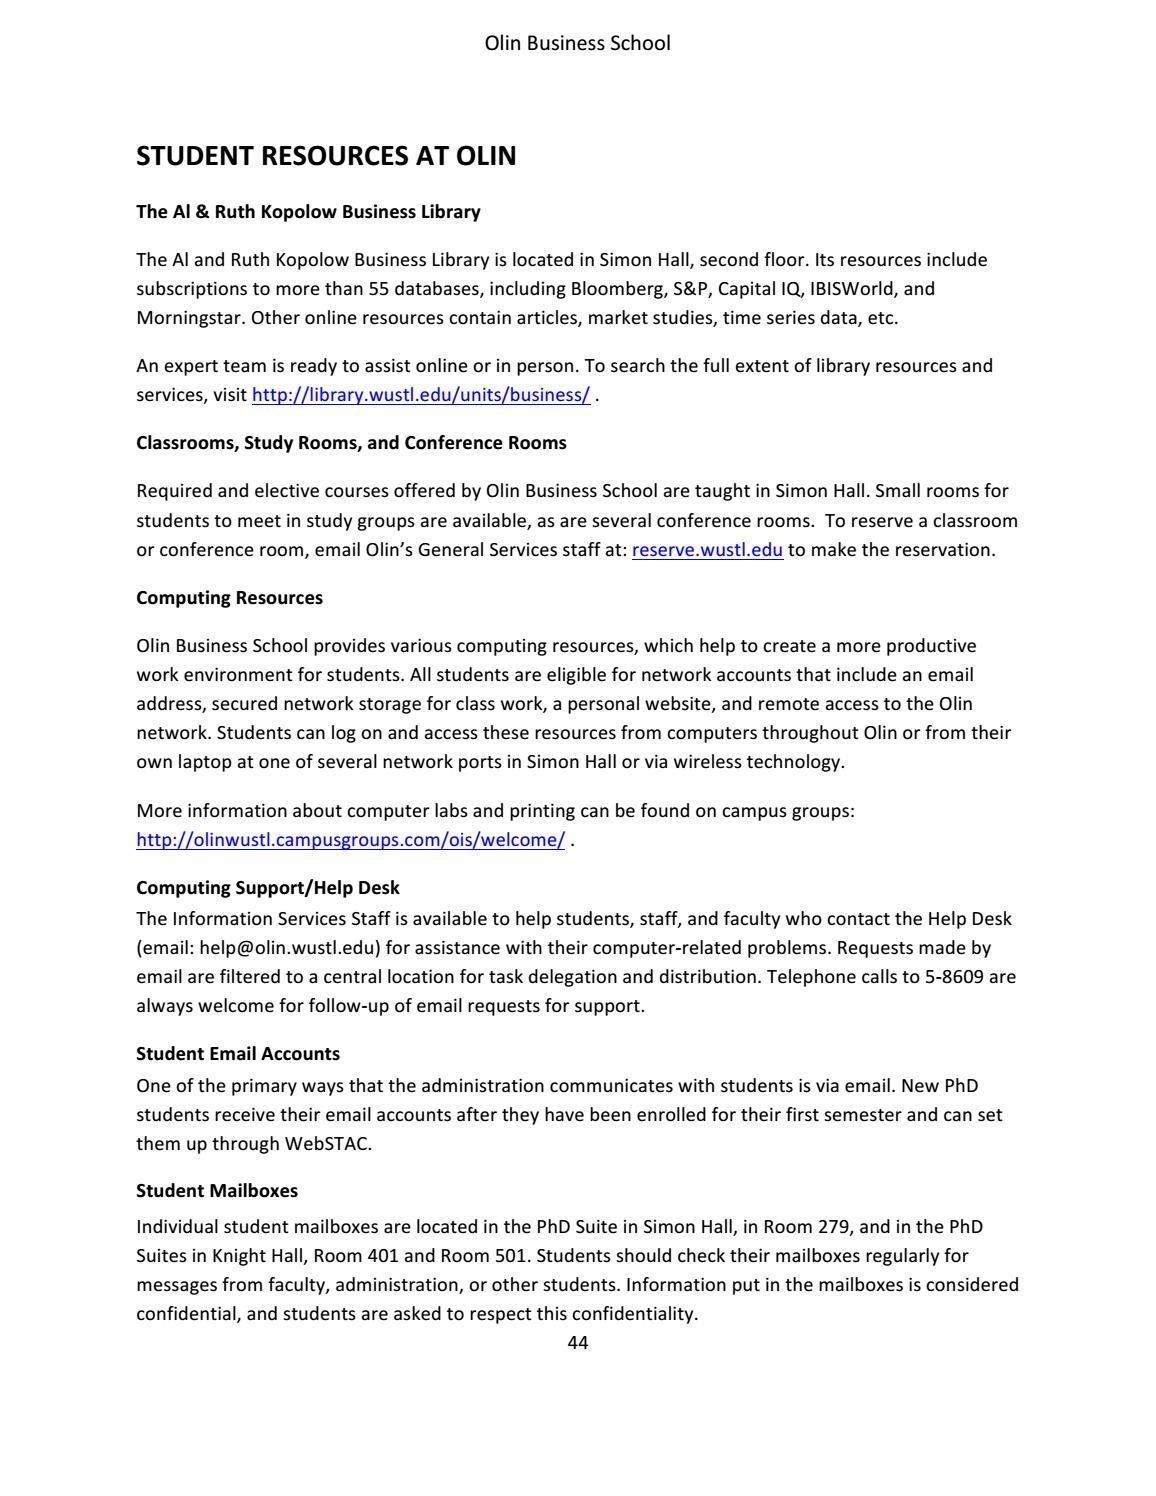 Olin Business School PhD Program Bulletin by Olin Business School